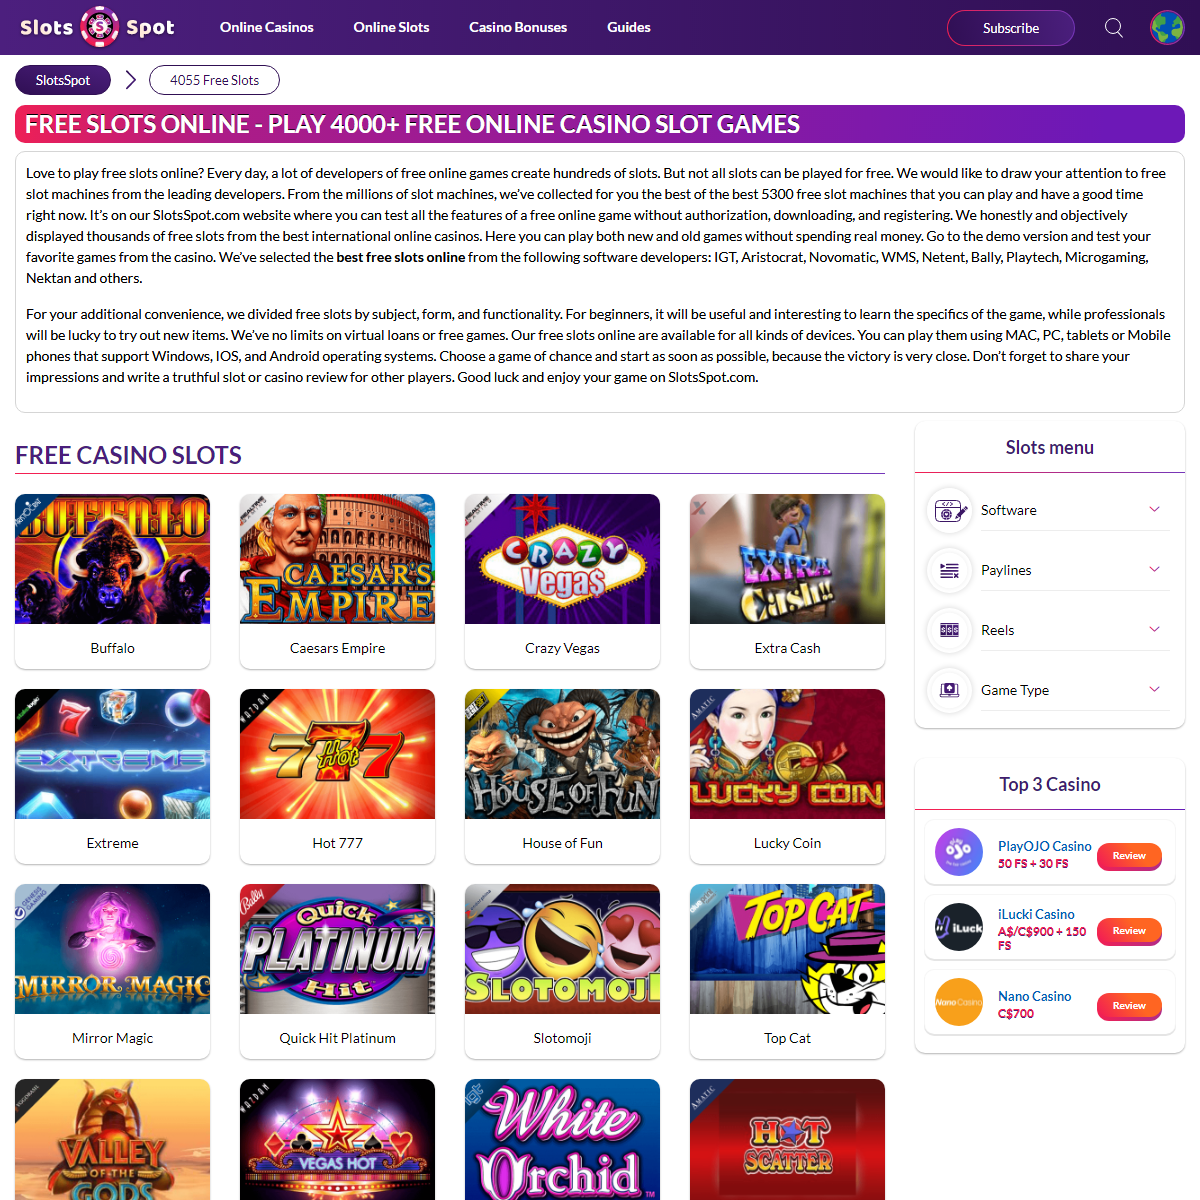 Free Slots Online - Play Free Casino Slot Machines